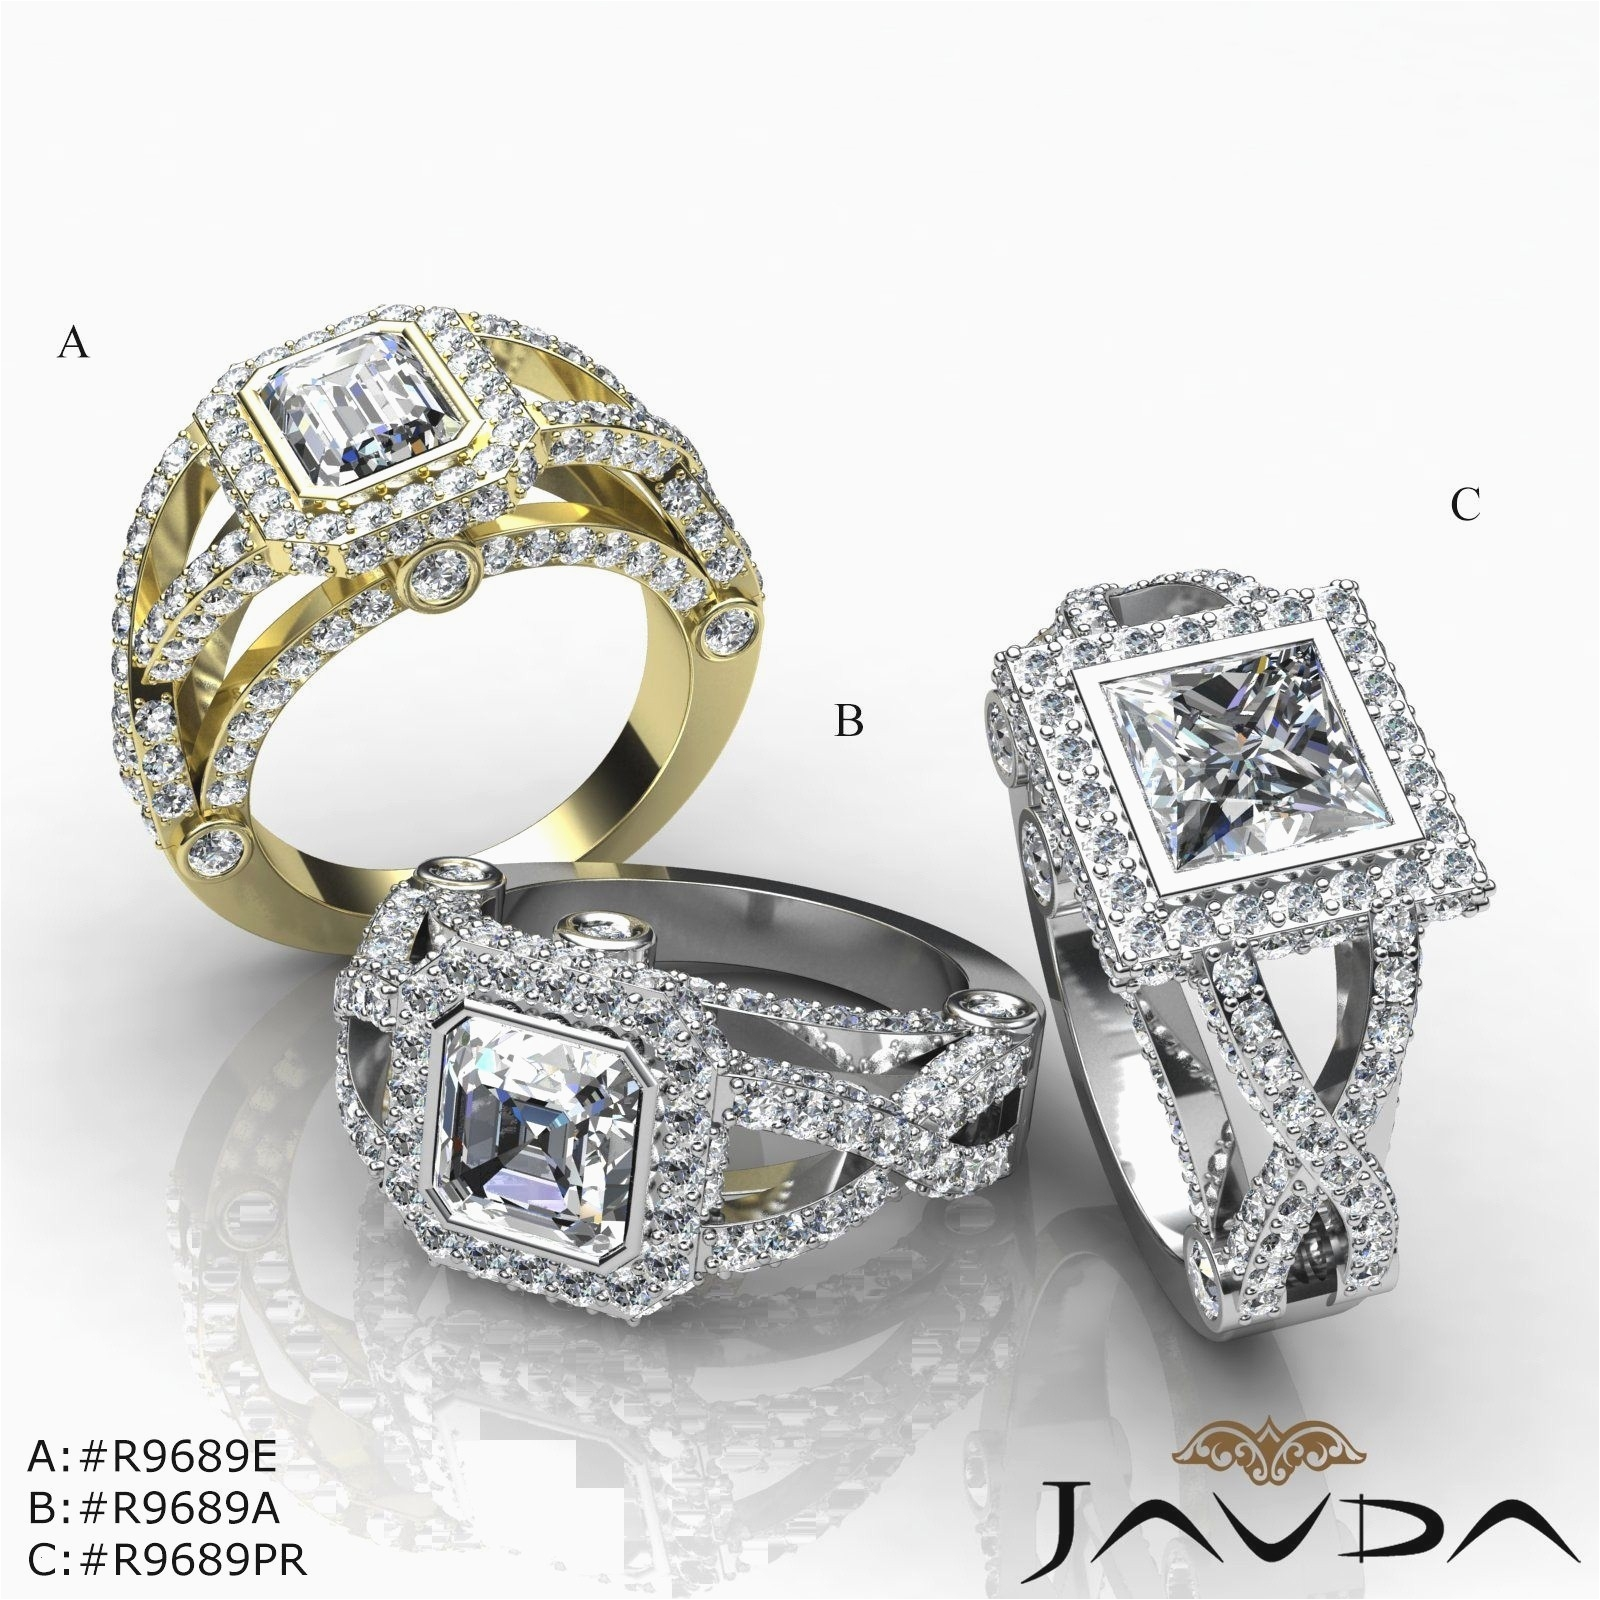 prepossessing big diamond wedding rings and pics wedding rings biggest wedding ring best eheringe kosten 0d